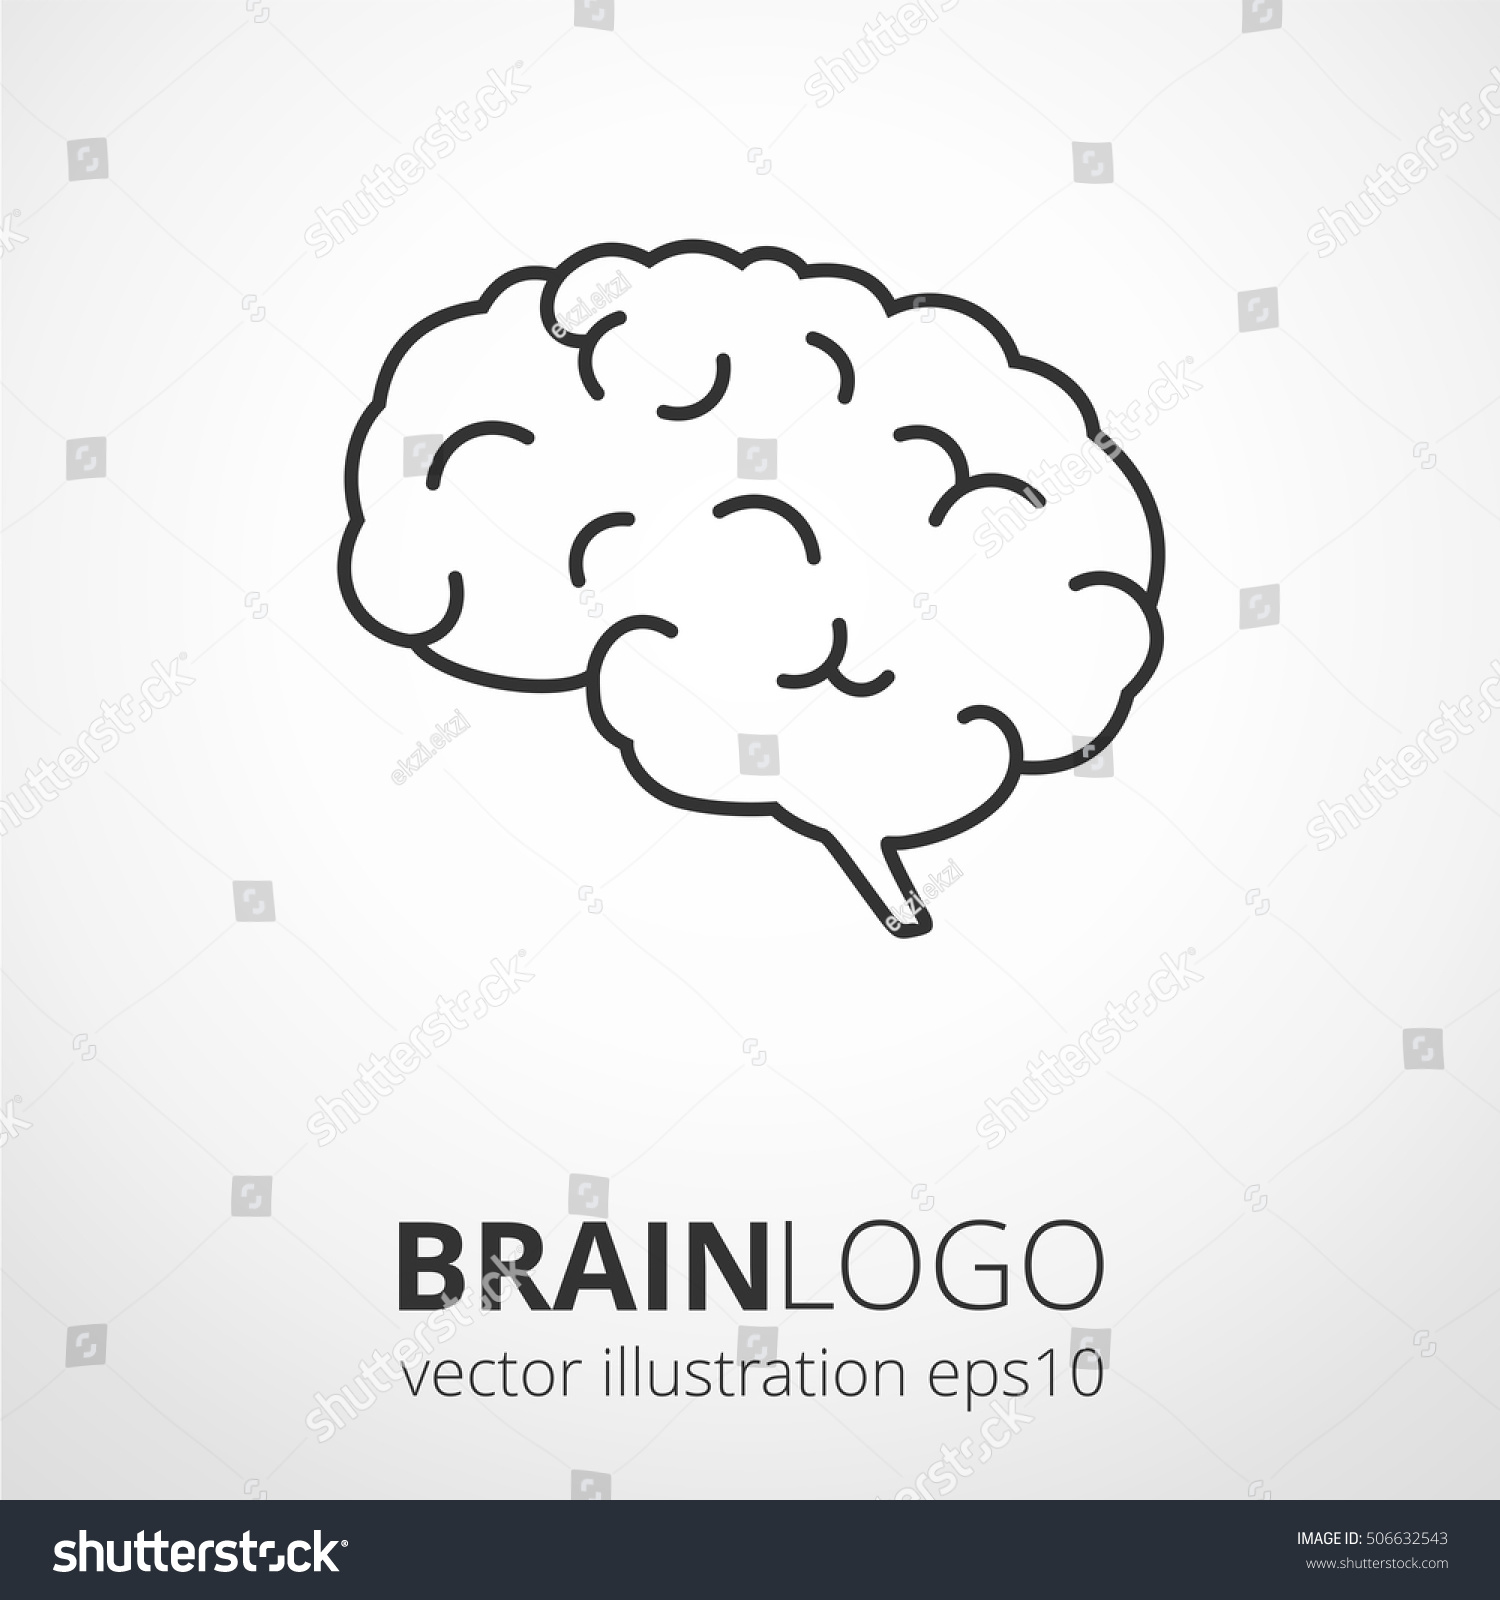 Simple human brain logo brain silhouette em vetor stock 506632543 simple human brain logo brain silhouette vector template brainstorm think idea logotype concept icon ccuart Gallery